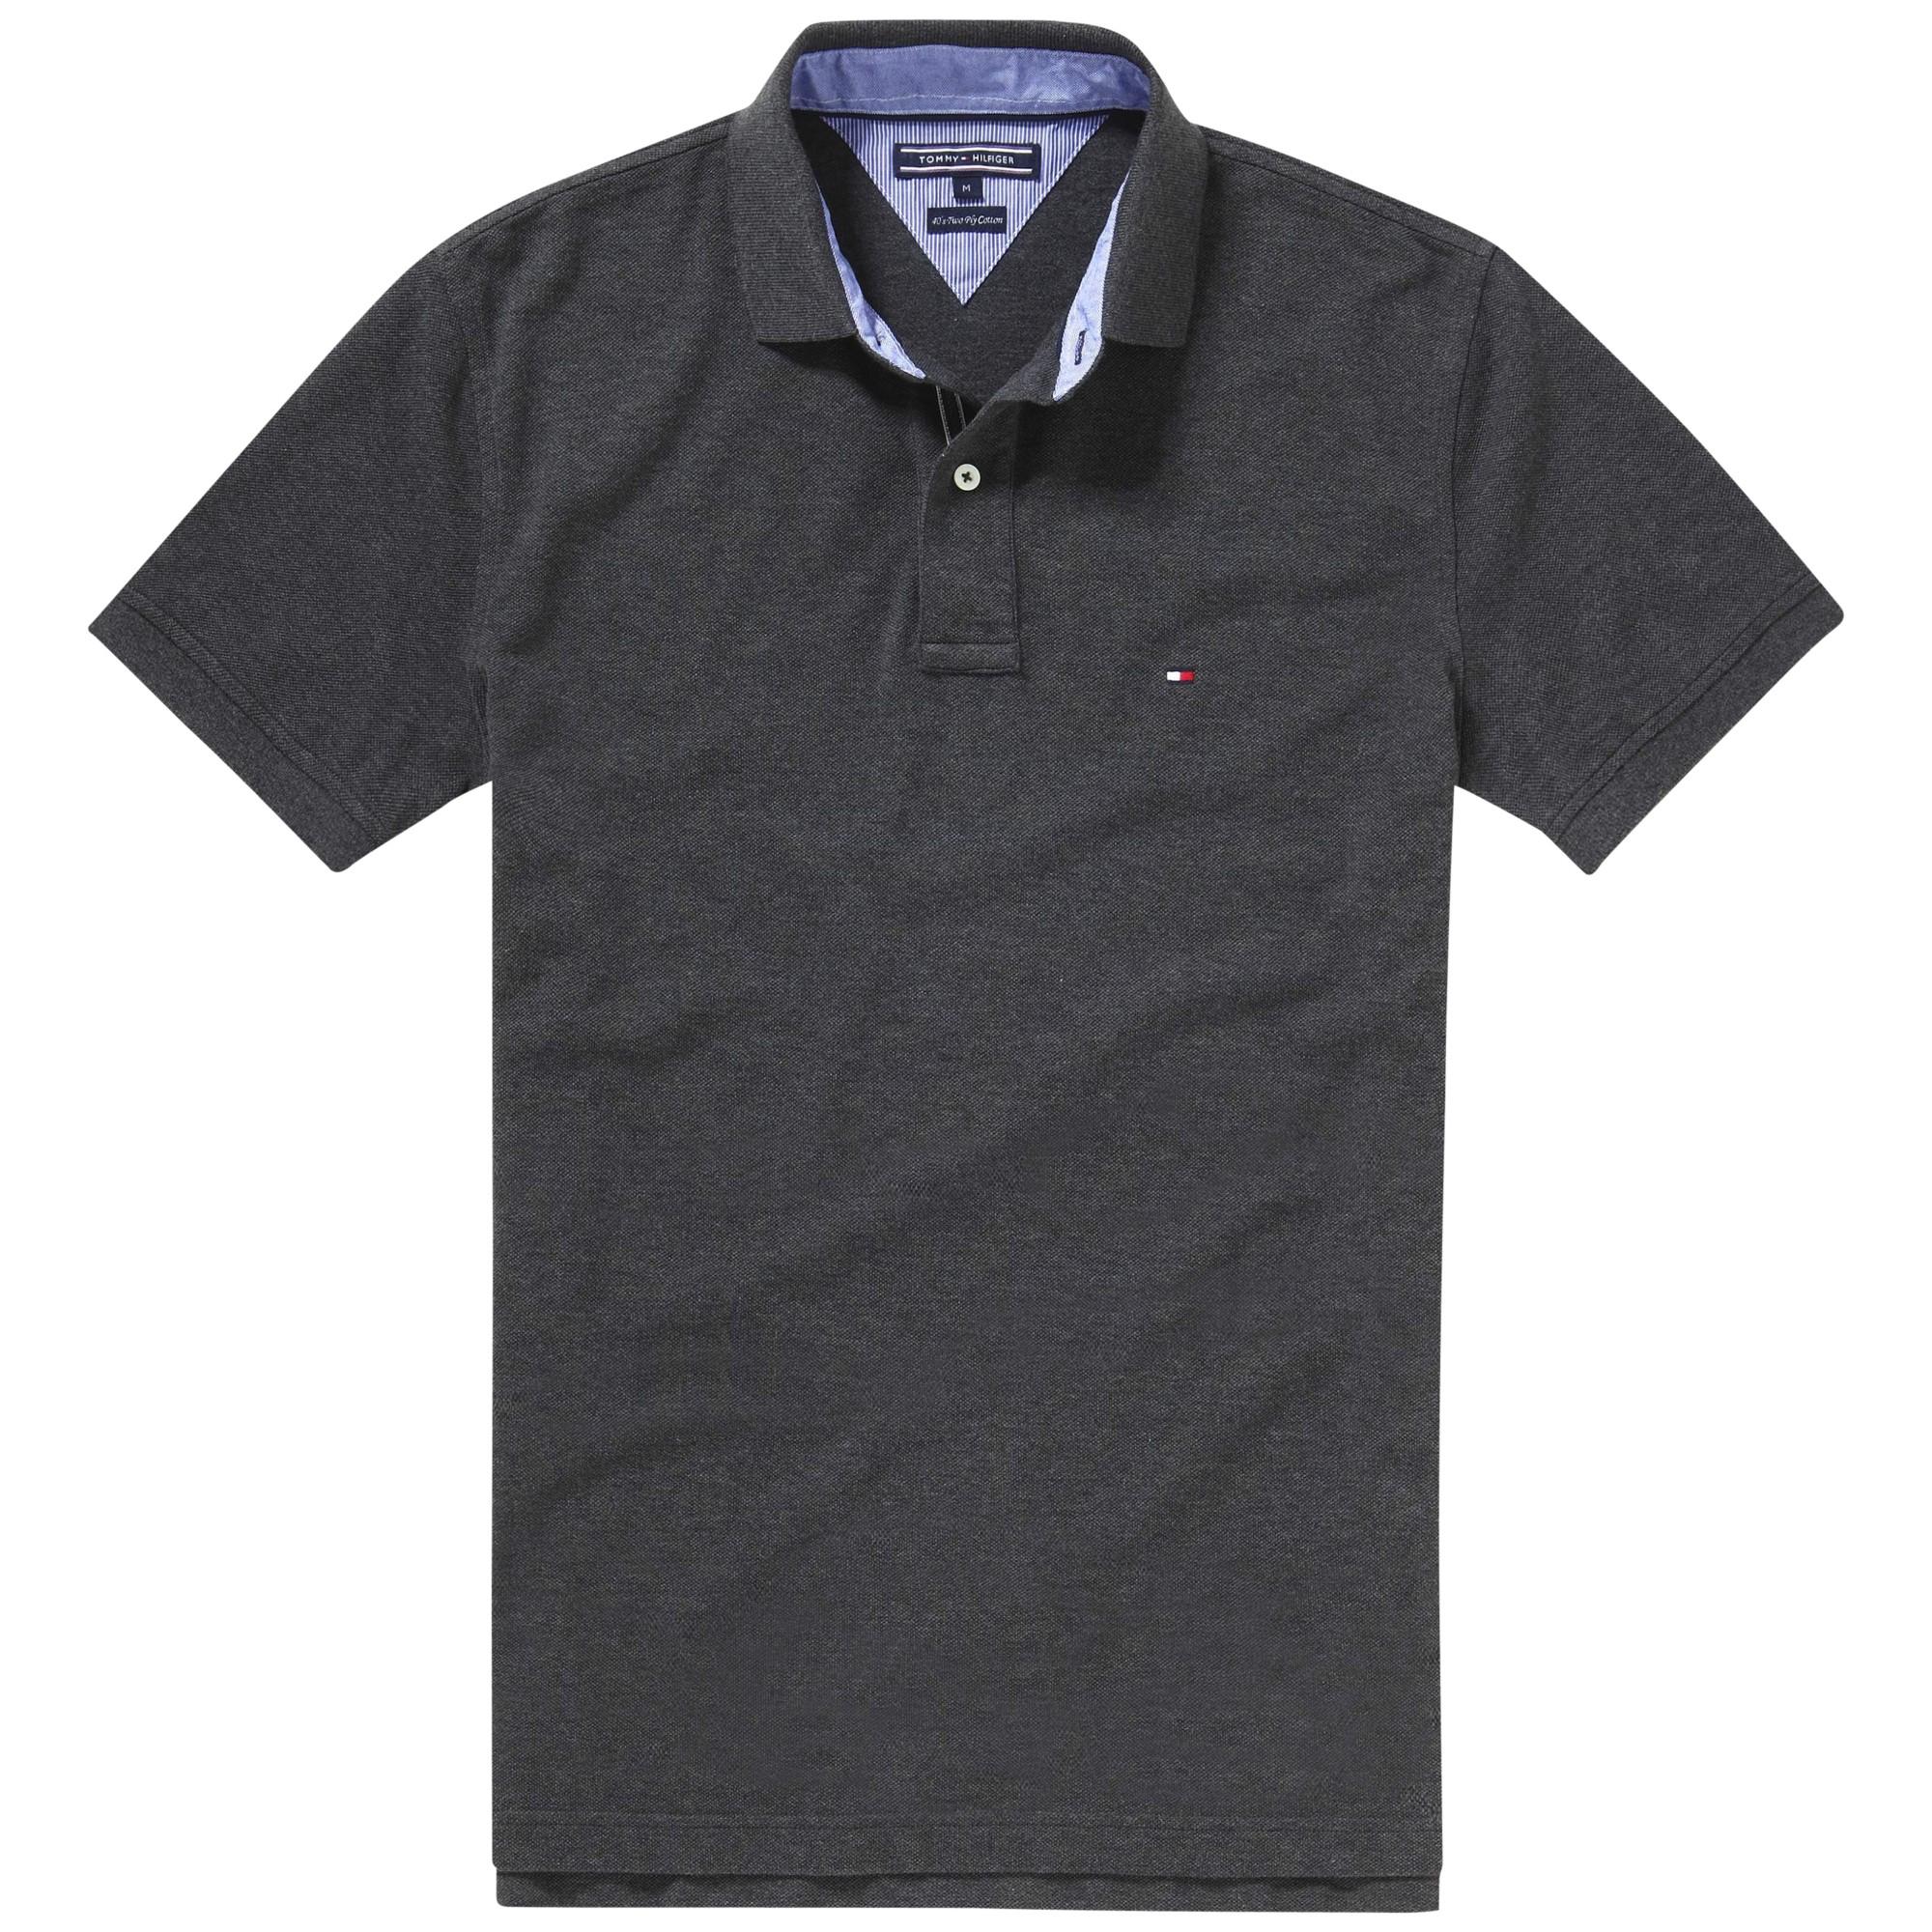 tommy hilfiger knit regular fit polo shirt in gray for men lyst. Black Bedroom Furniture Sets. Home Design Ideas